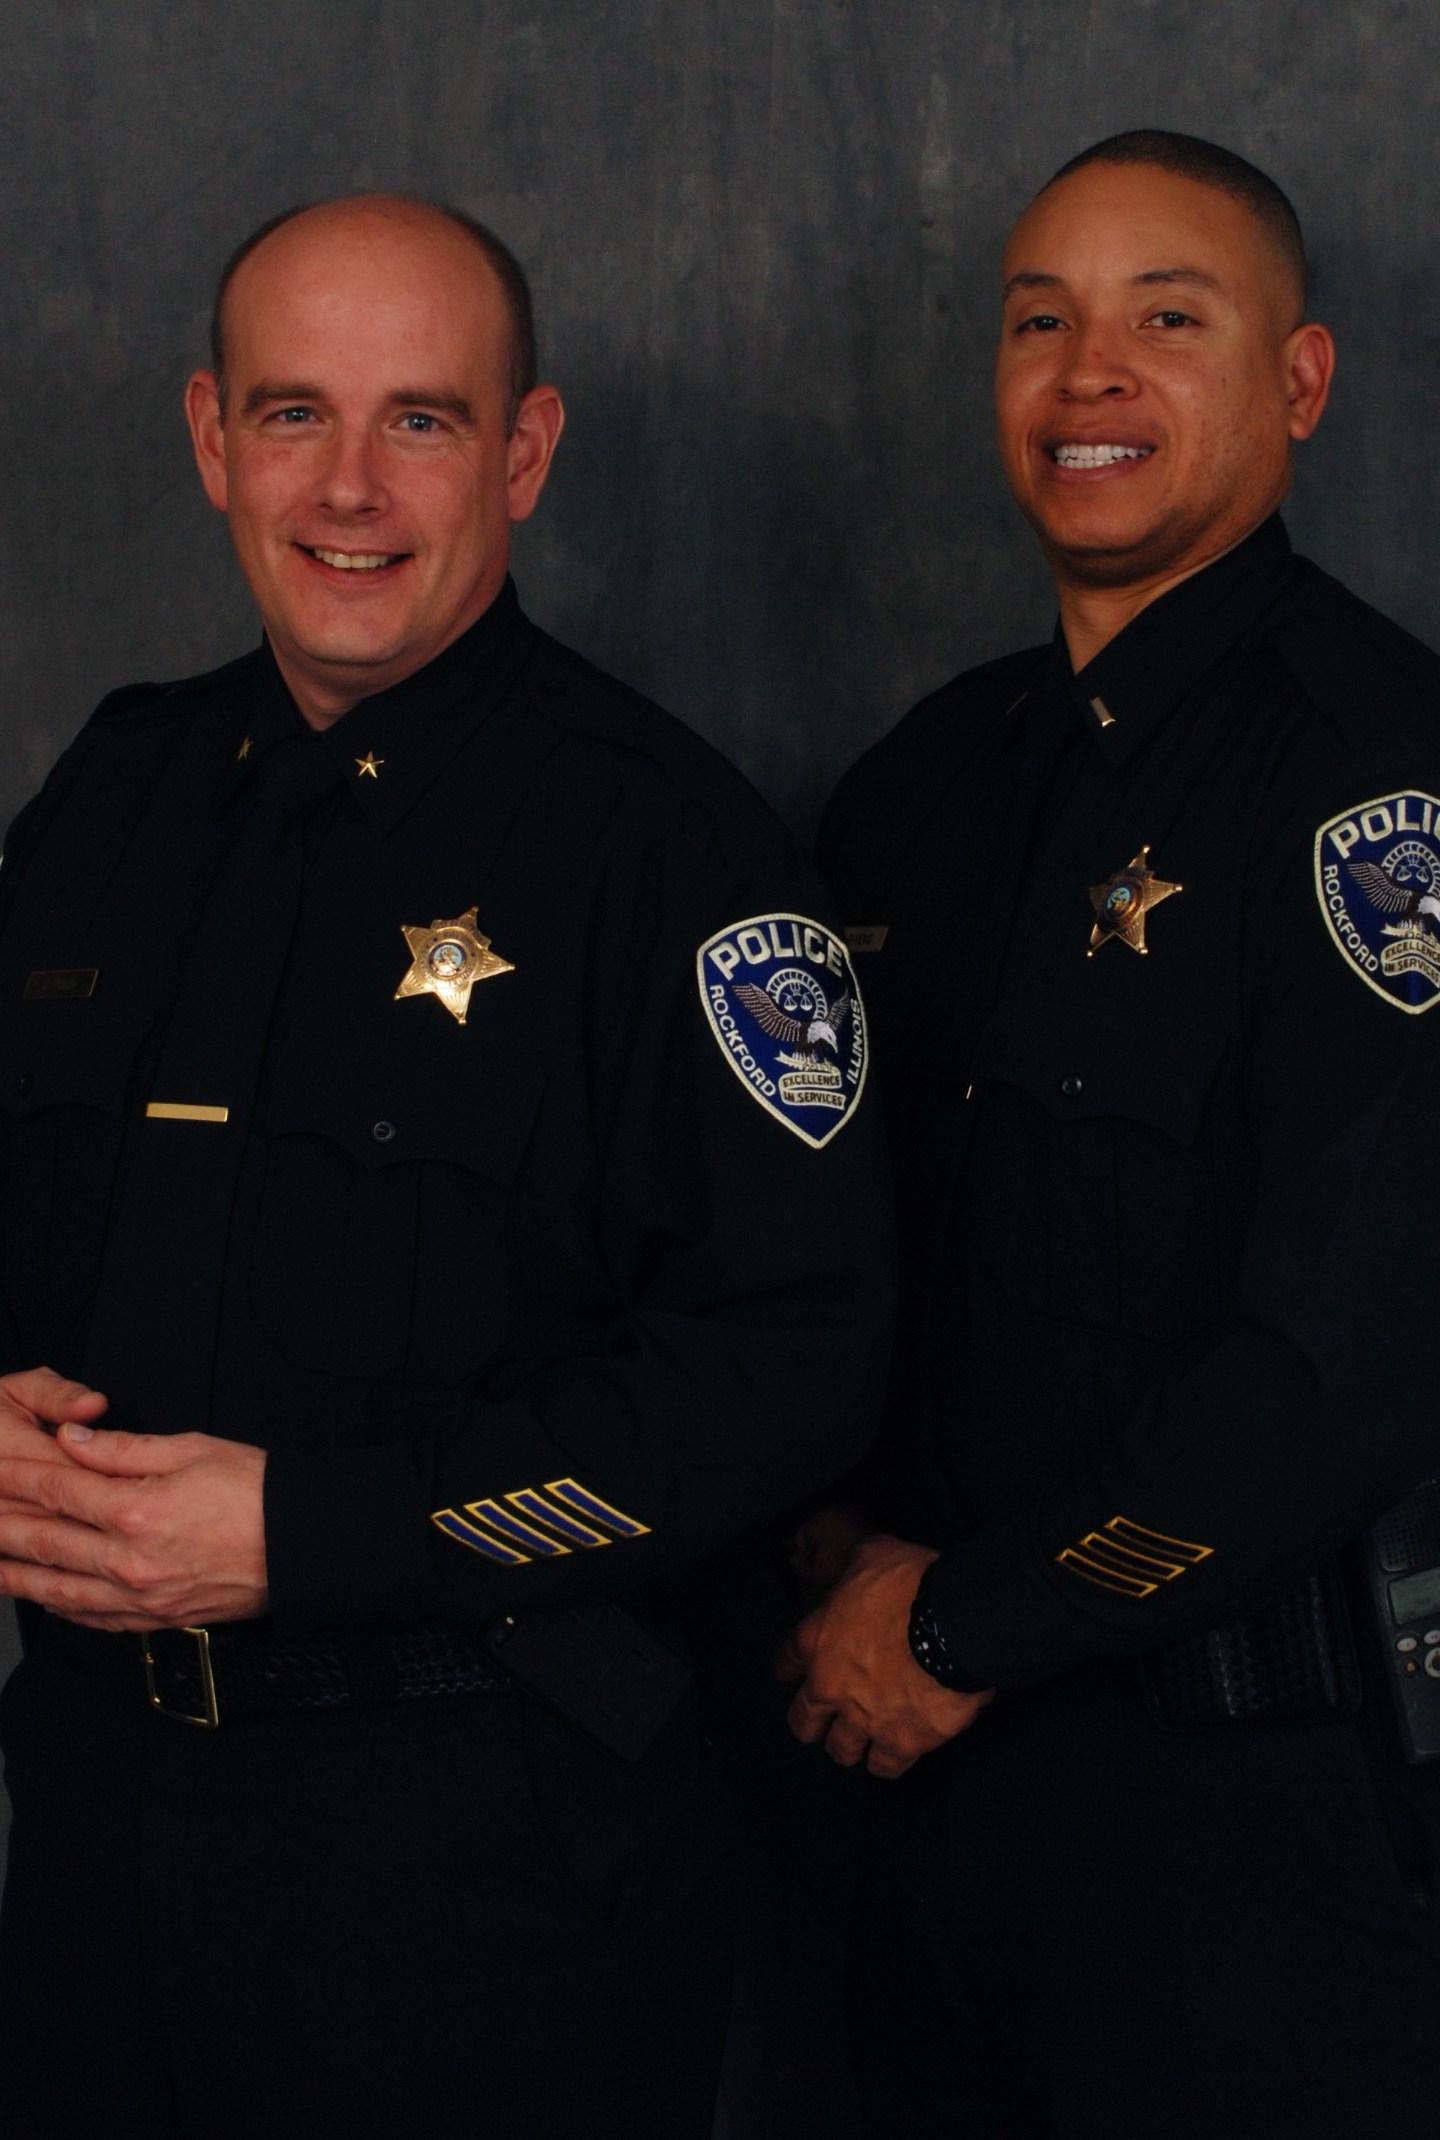 Rockford New Police Uniforms_1452890325106.jpg